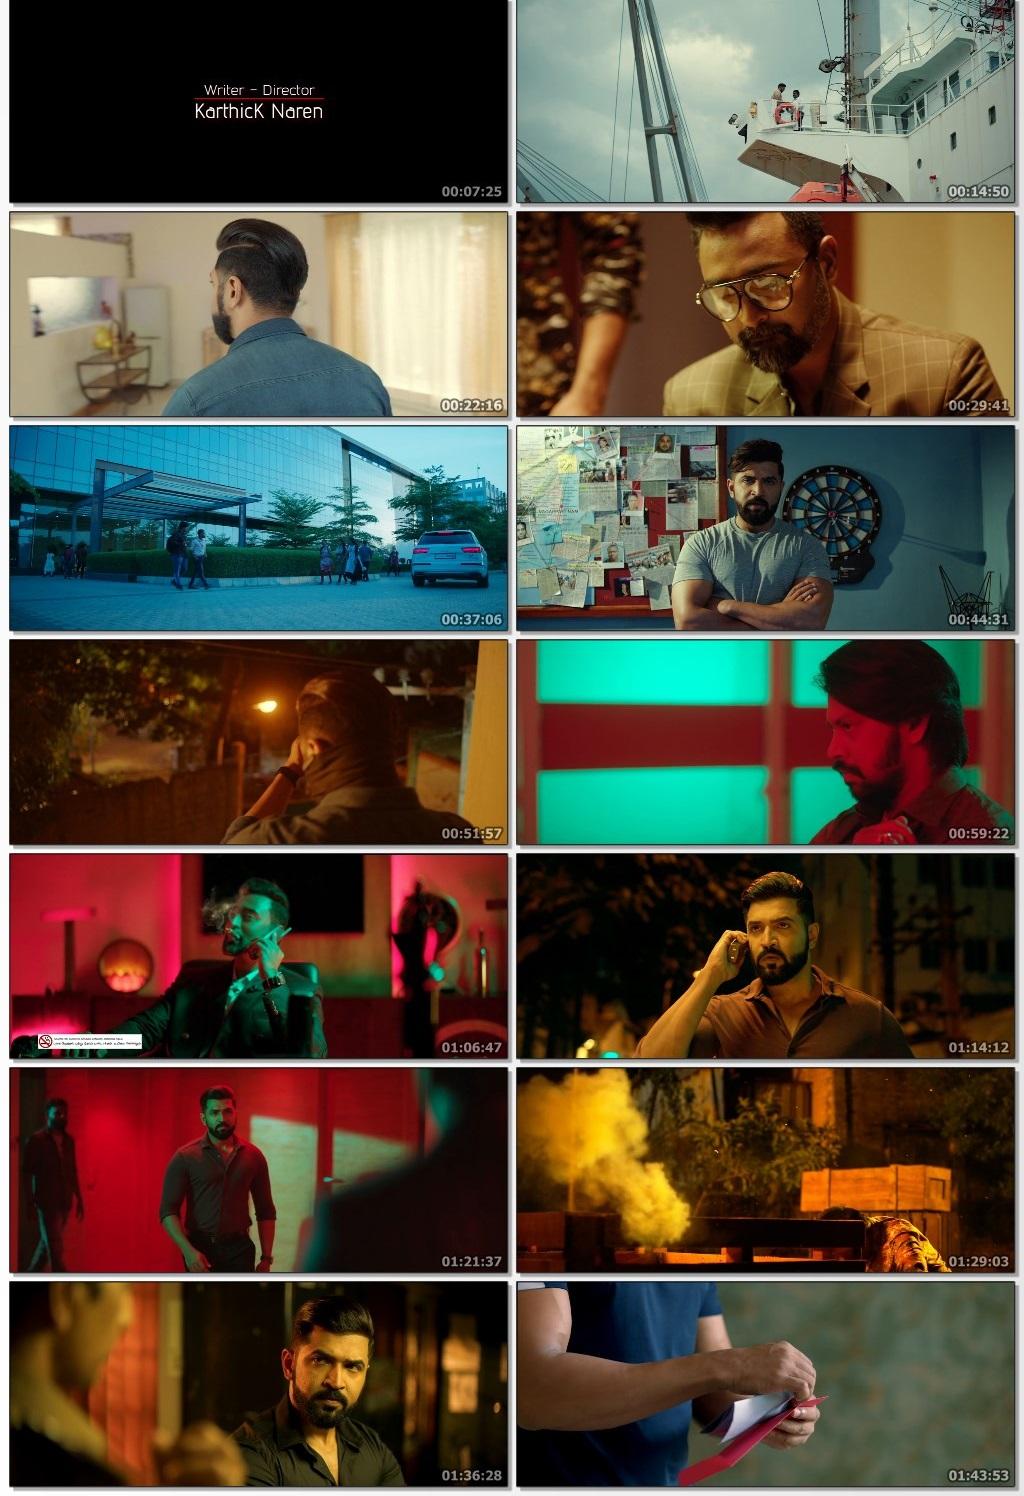 Mafia-Chapter-1-2020-www-9kmovies-cool-Hindi-ORG-Dual-Audio-720p-UNCUT-HDRip-ESubs-1-2-GB-mkv-thumbs